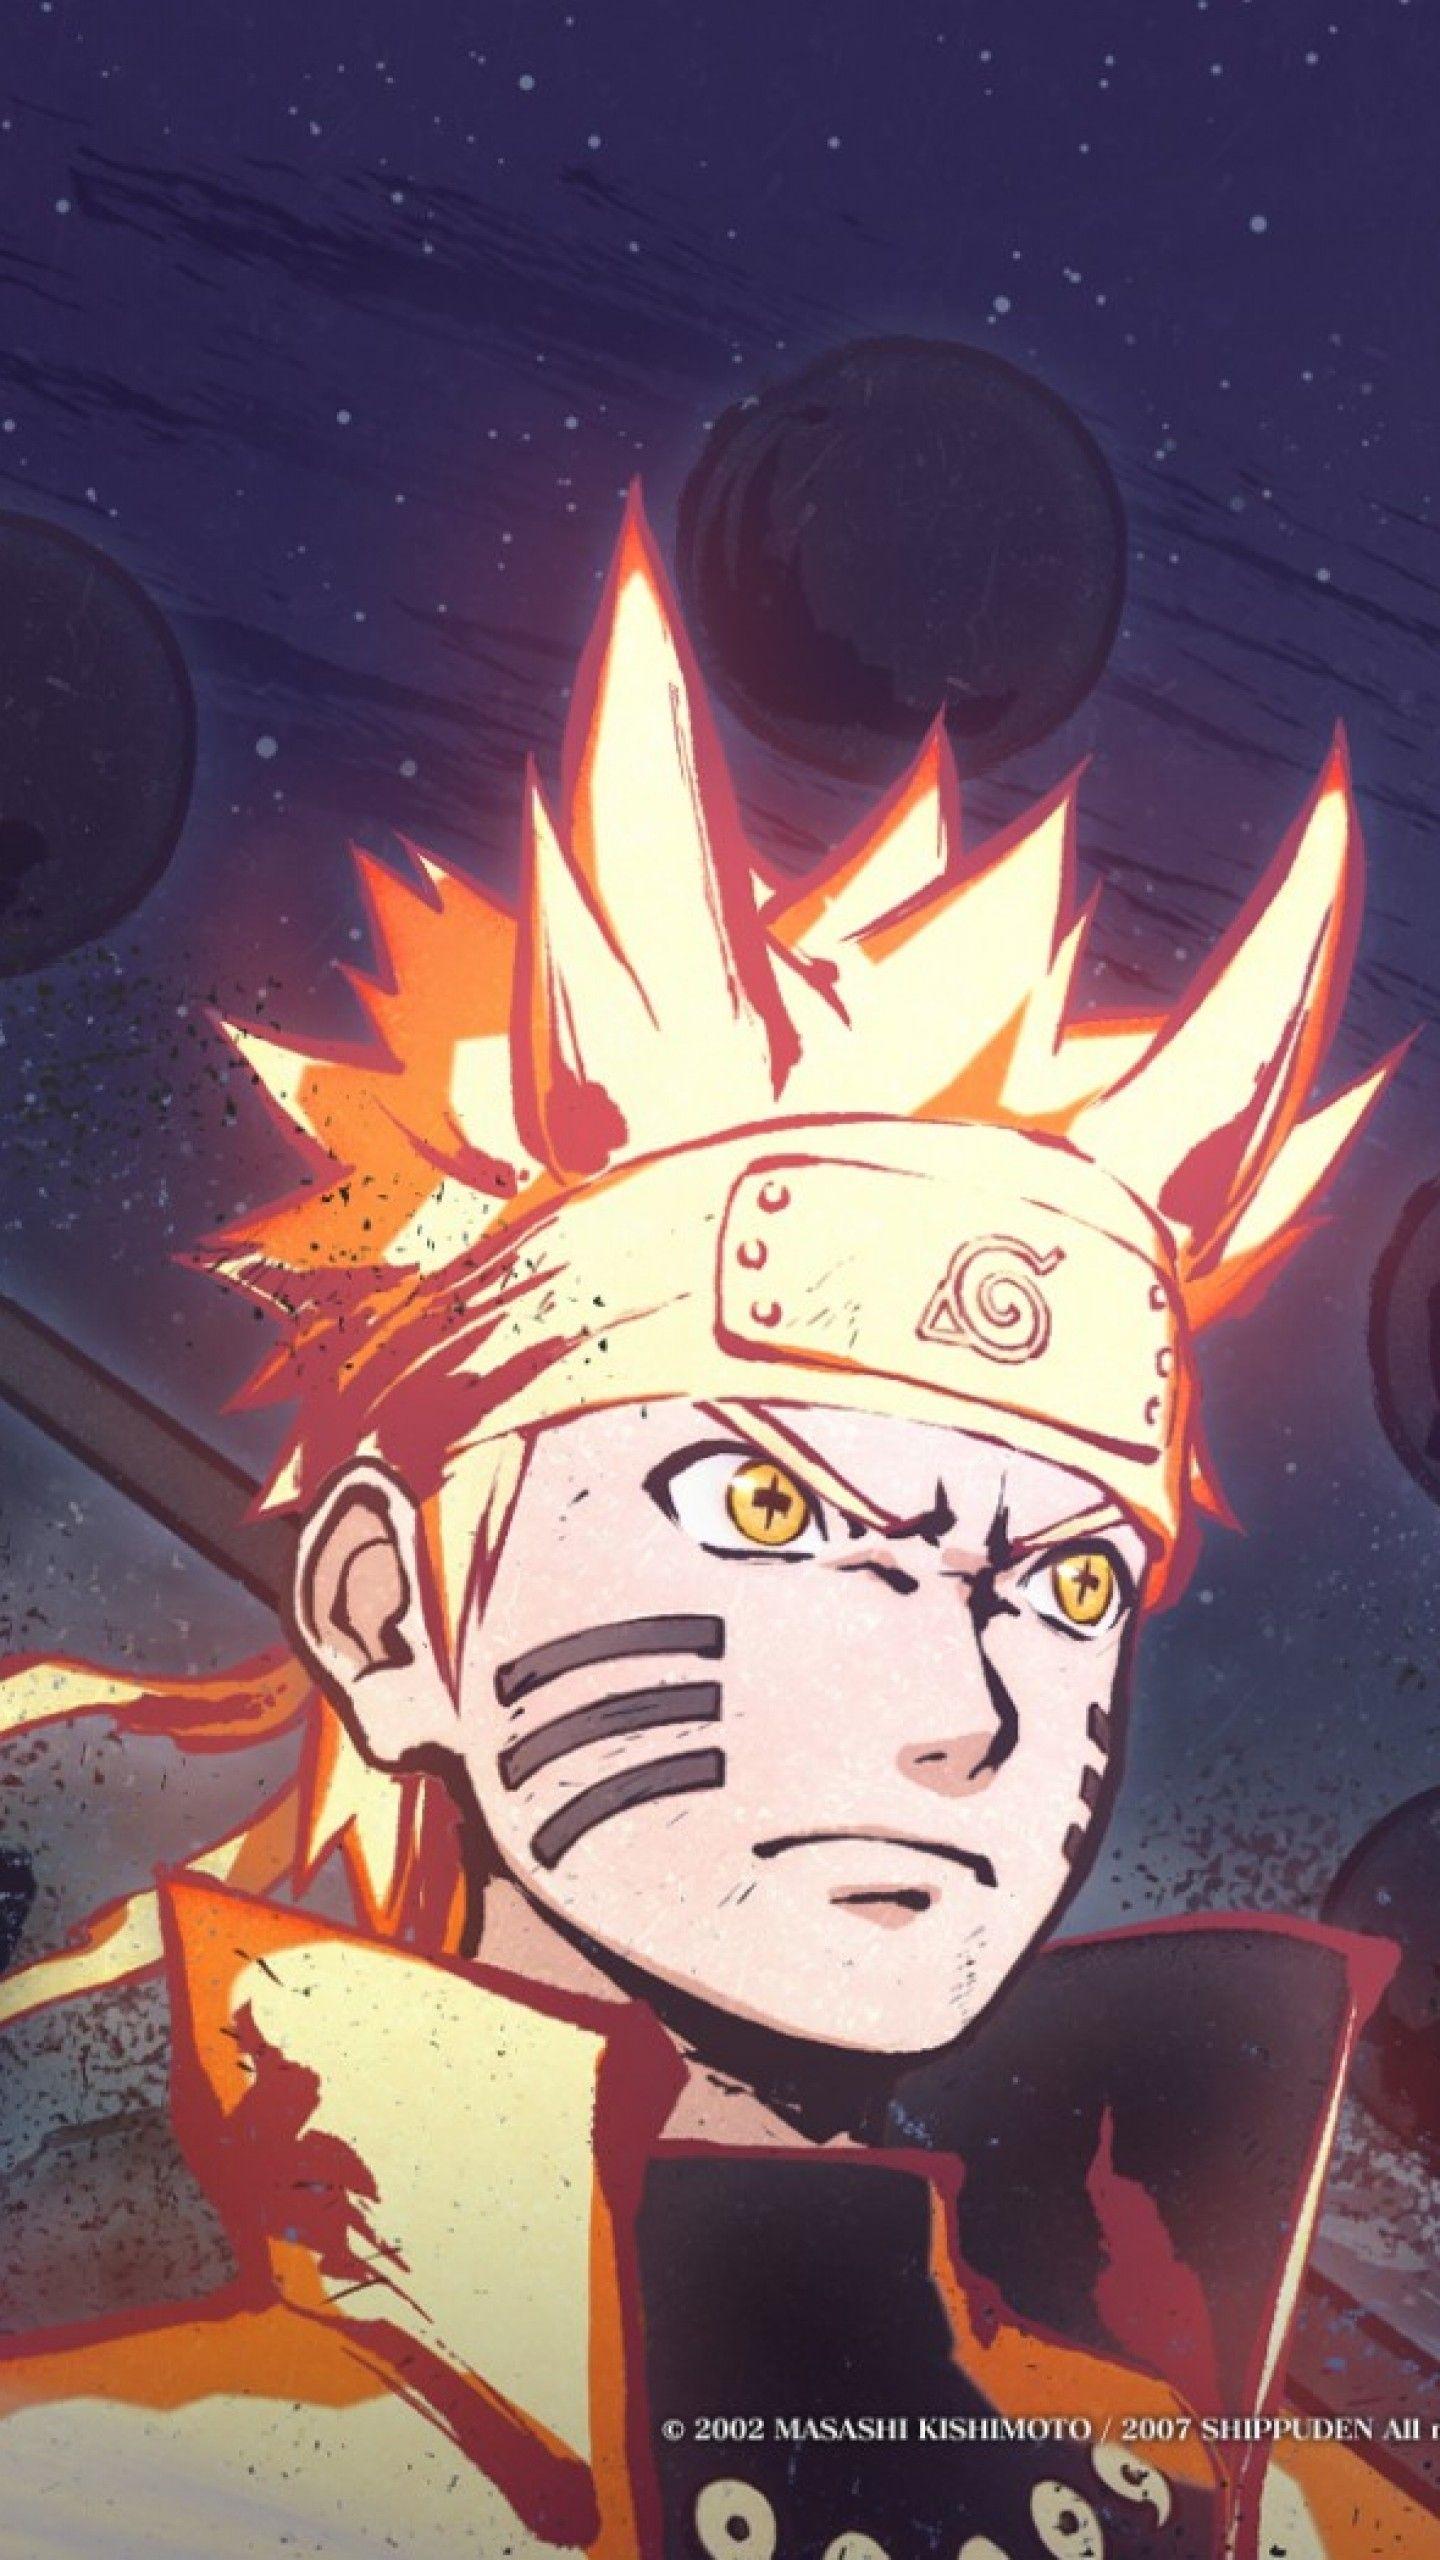 1440x2560 Preview Papel De Parede Naruto Tempestade 4 Ninja Final Sasuke Uchiha 1440x2560 Anime Naruto Shippuden Anime Wallpaper Naruto Shippuden